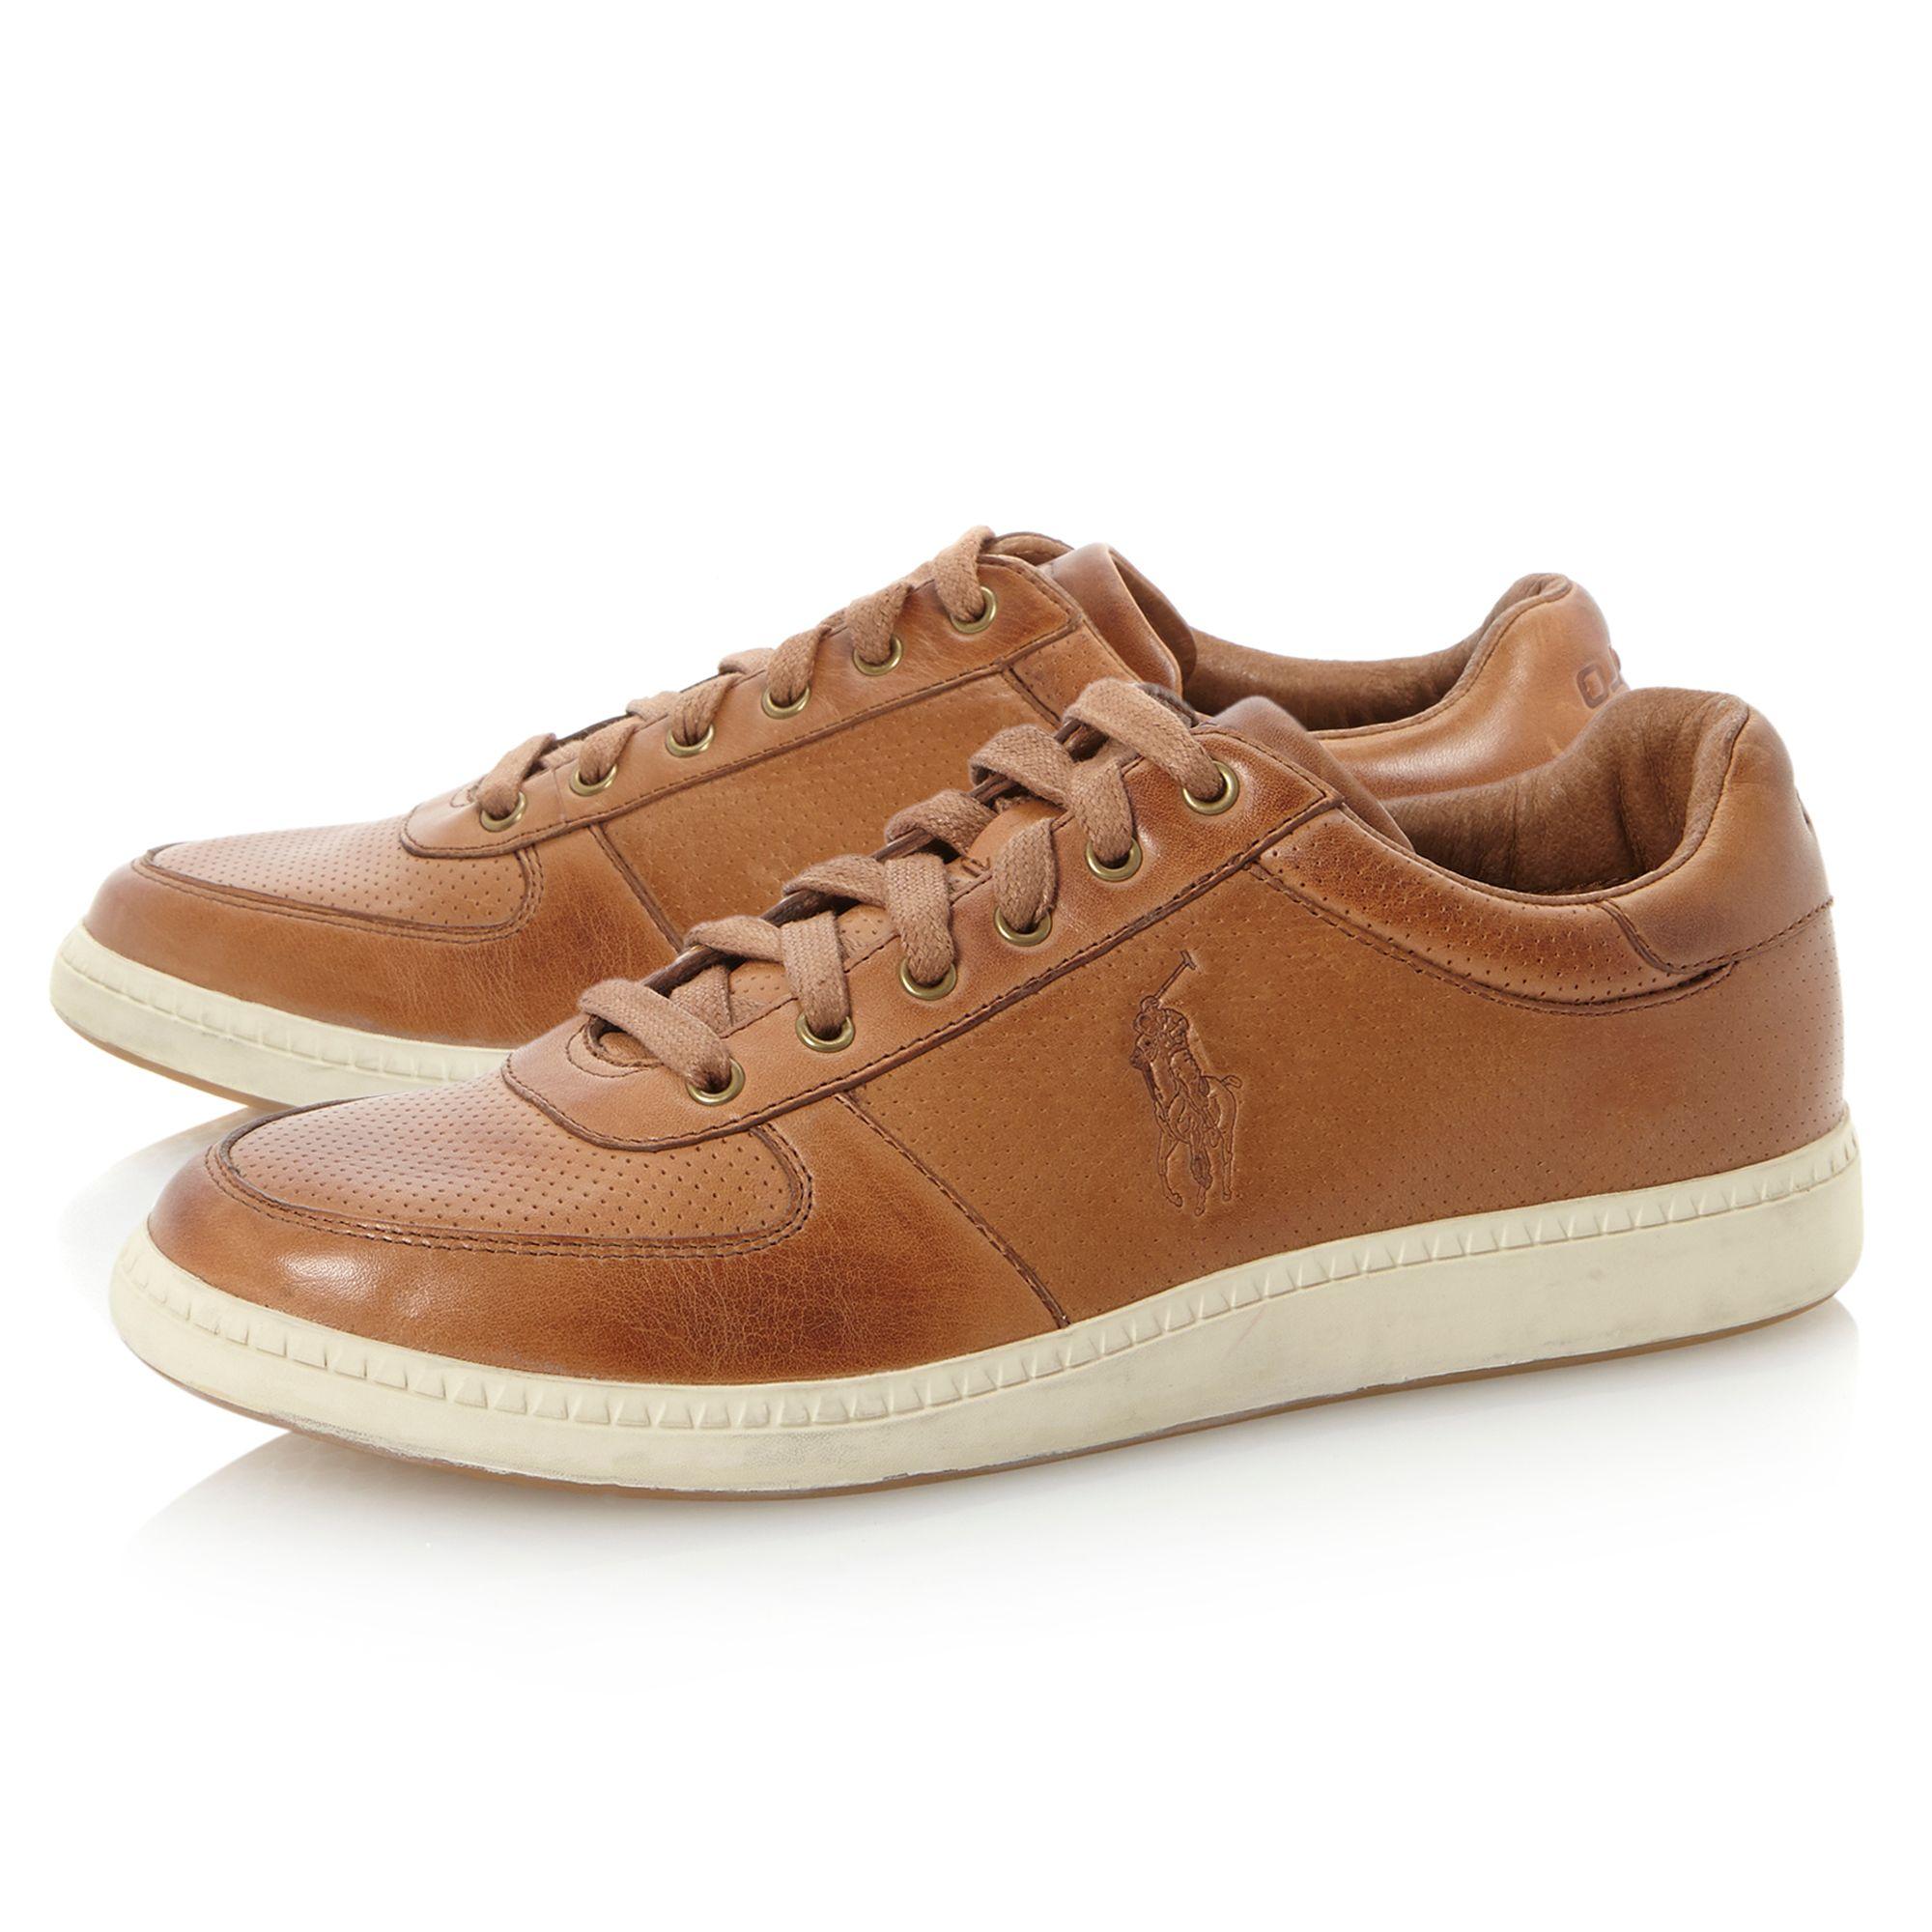 polo ralph lauren hernando smart leather sneaker in brown for men lyst. Black Bedroom Furniture Sets. Home Design Ideas